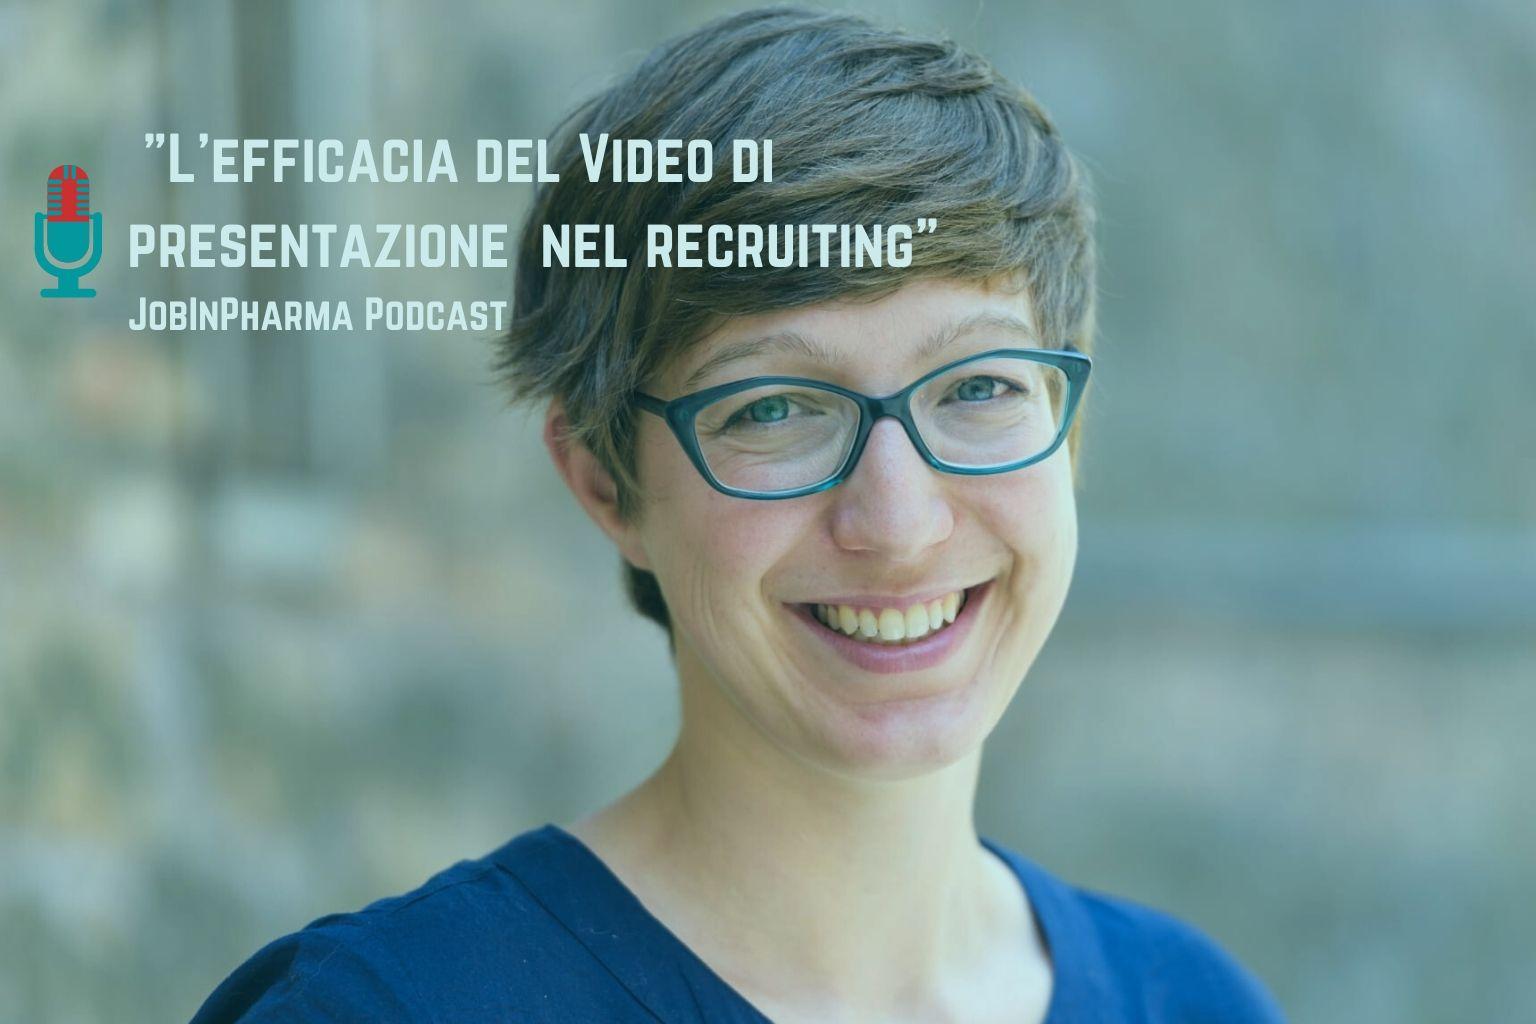 diane muller jobinpharma - job in pharma - esserre pharma - cv recuiting video